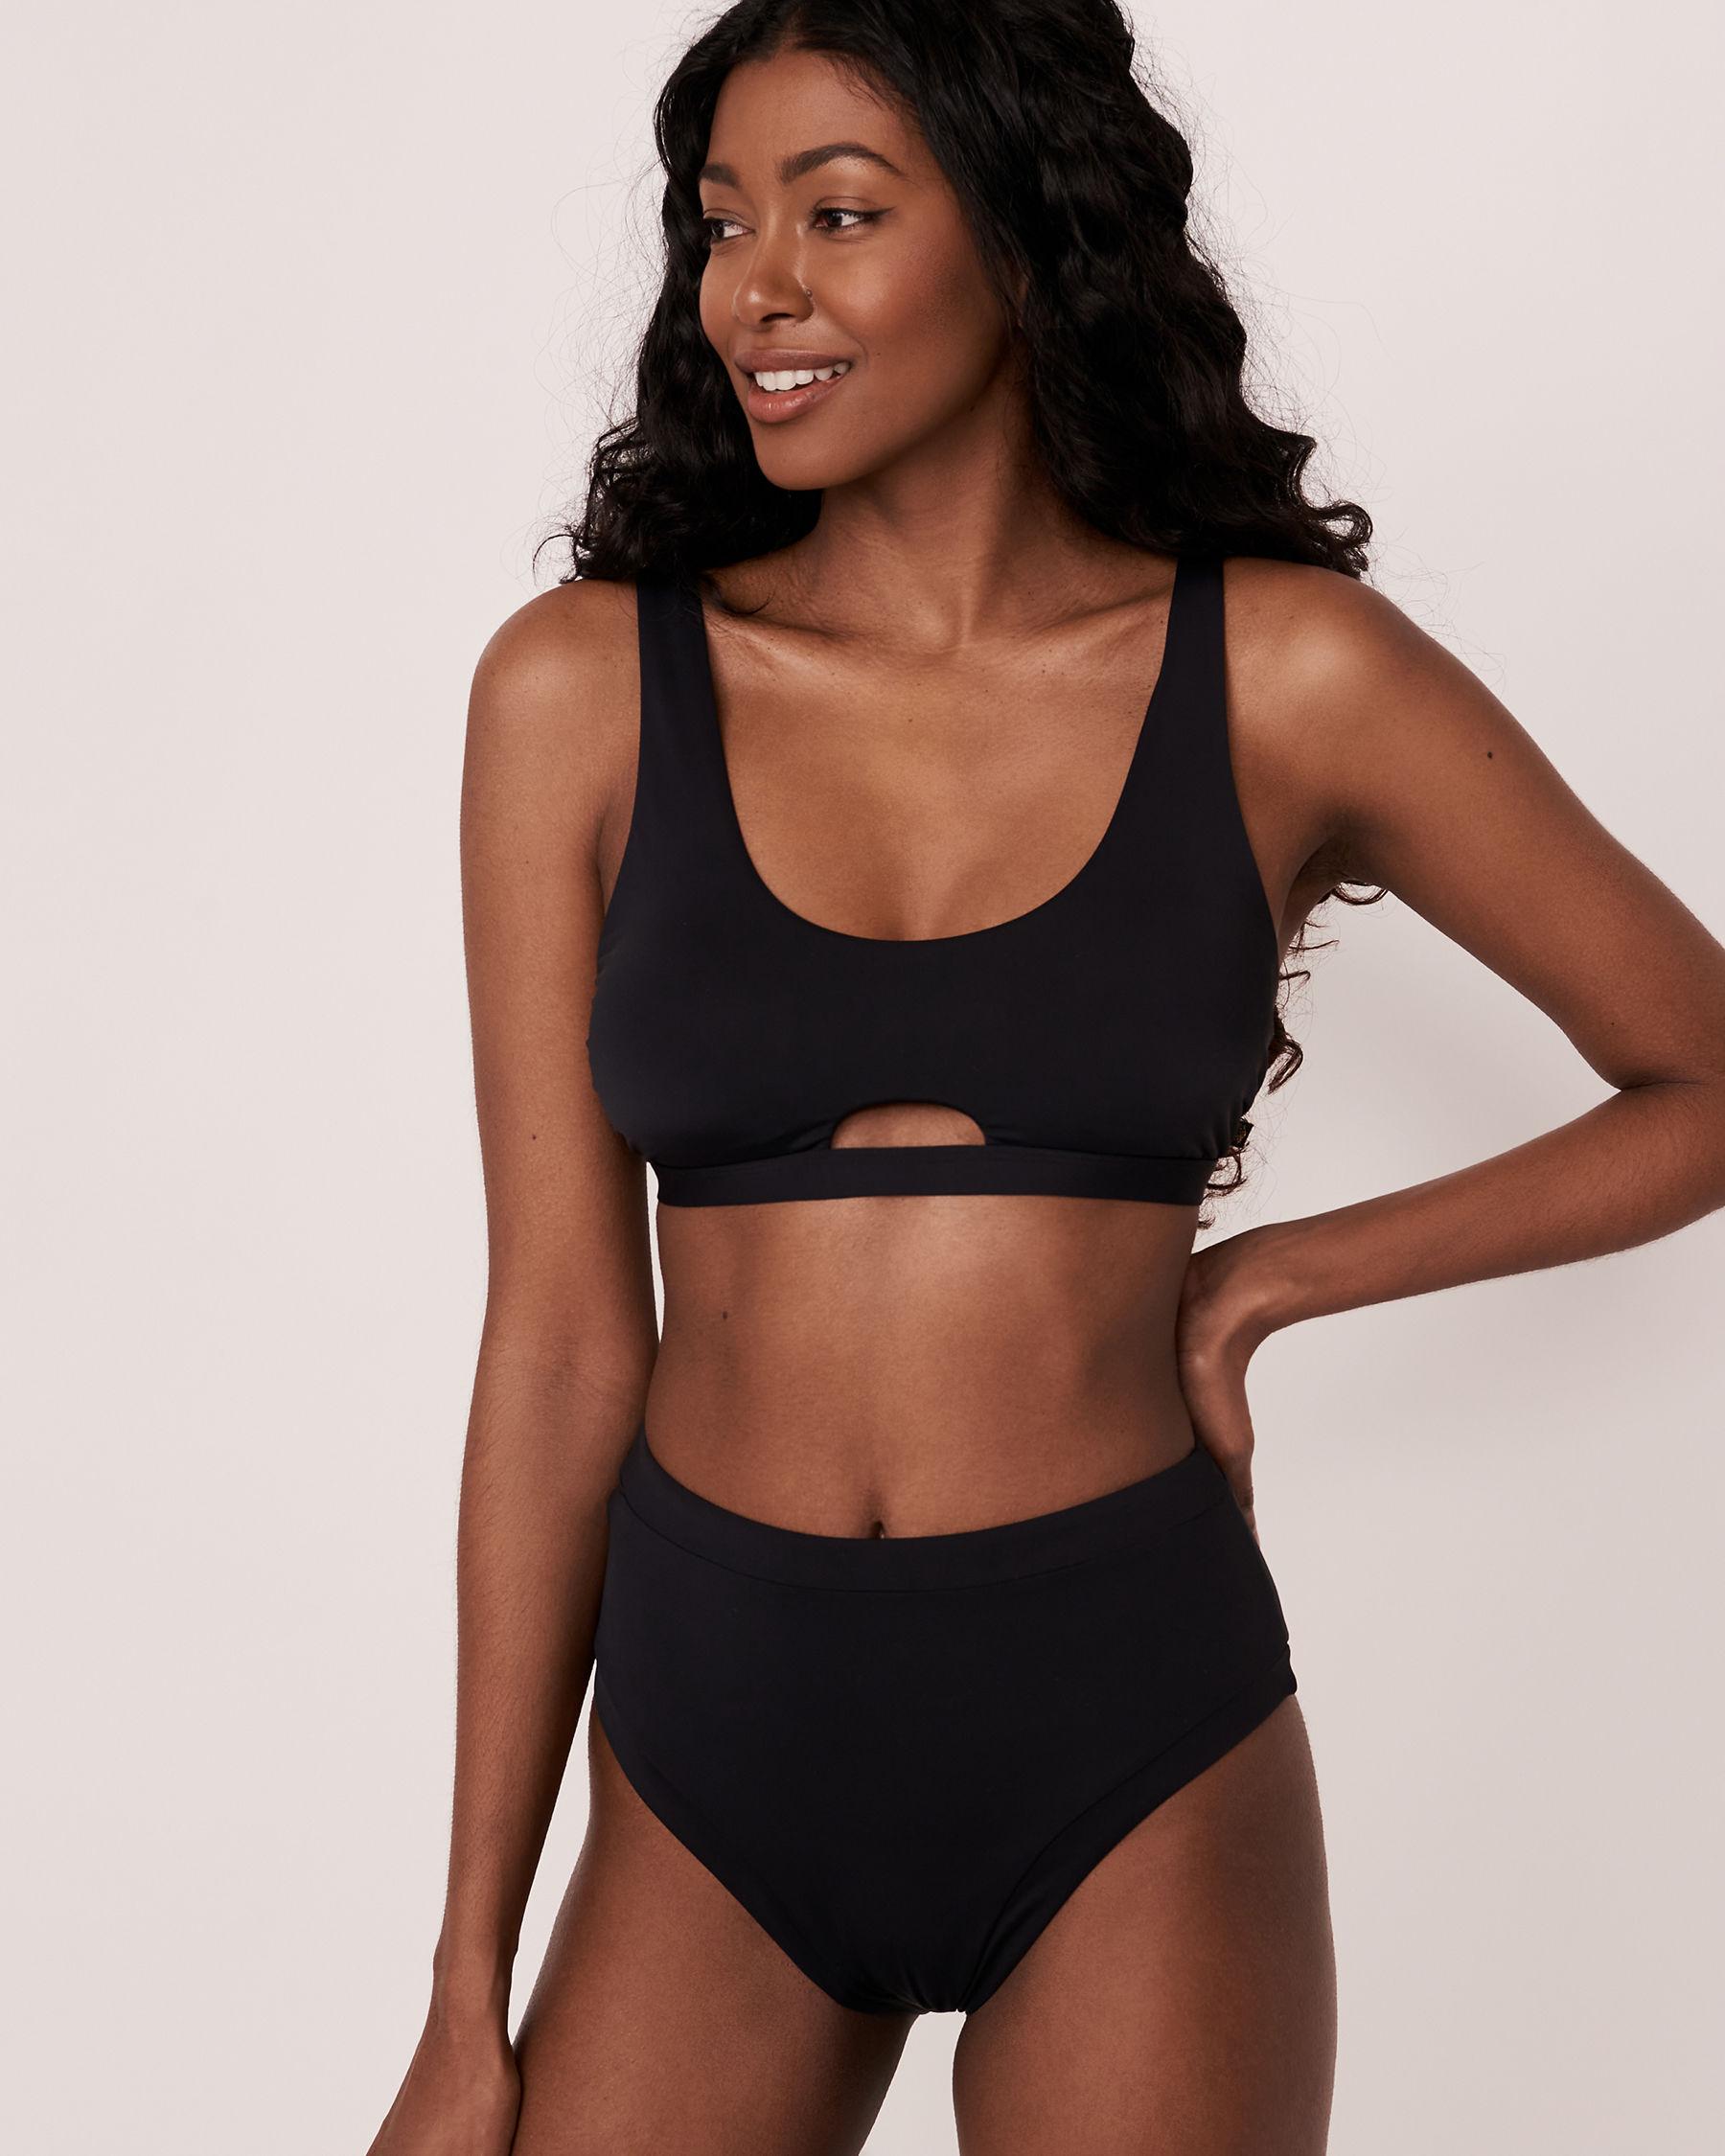 LA VIE EN ROSE AQUA SOLID High Waist Bikini Bottom Black 70300105 - View3